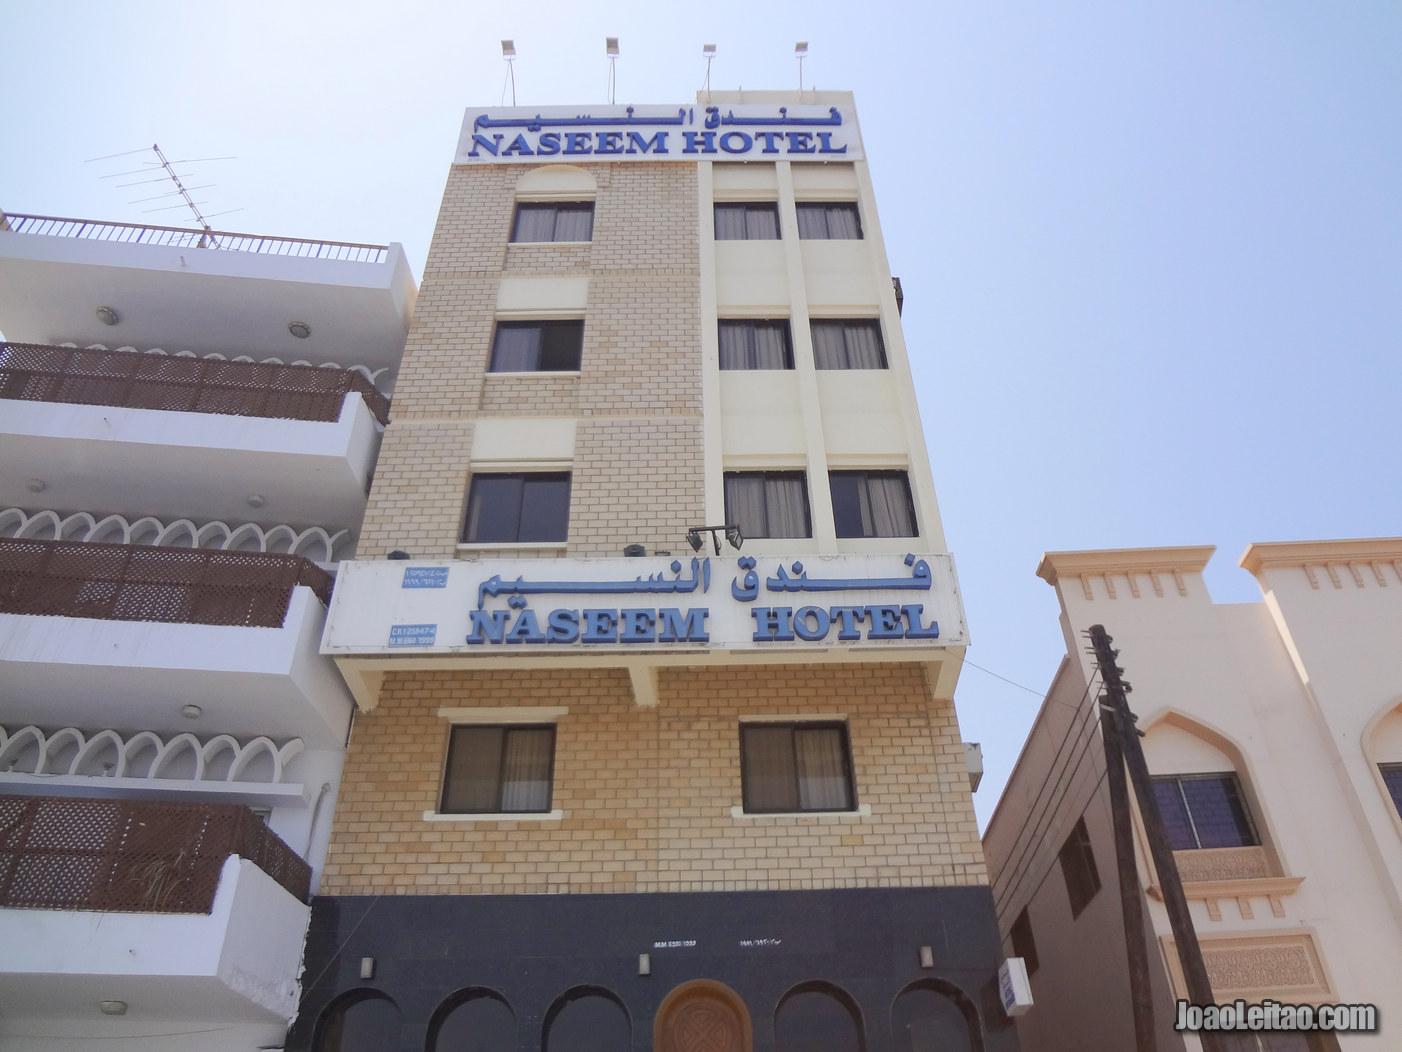 Hotel Naseem em Mascate, Omã